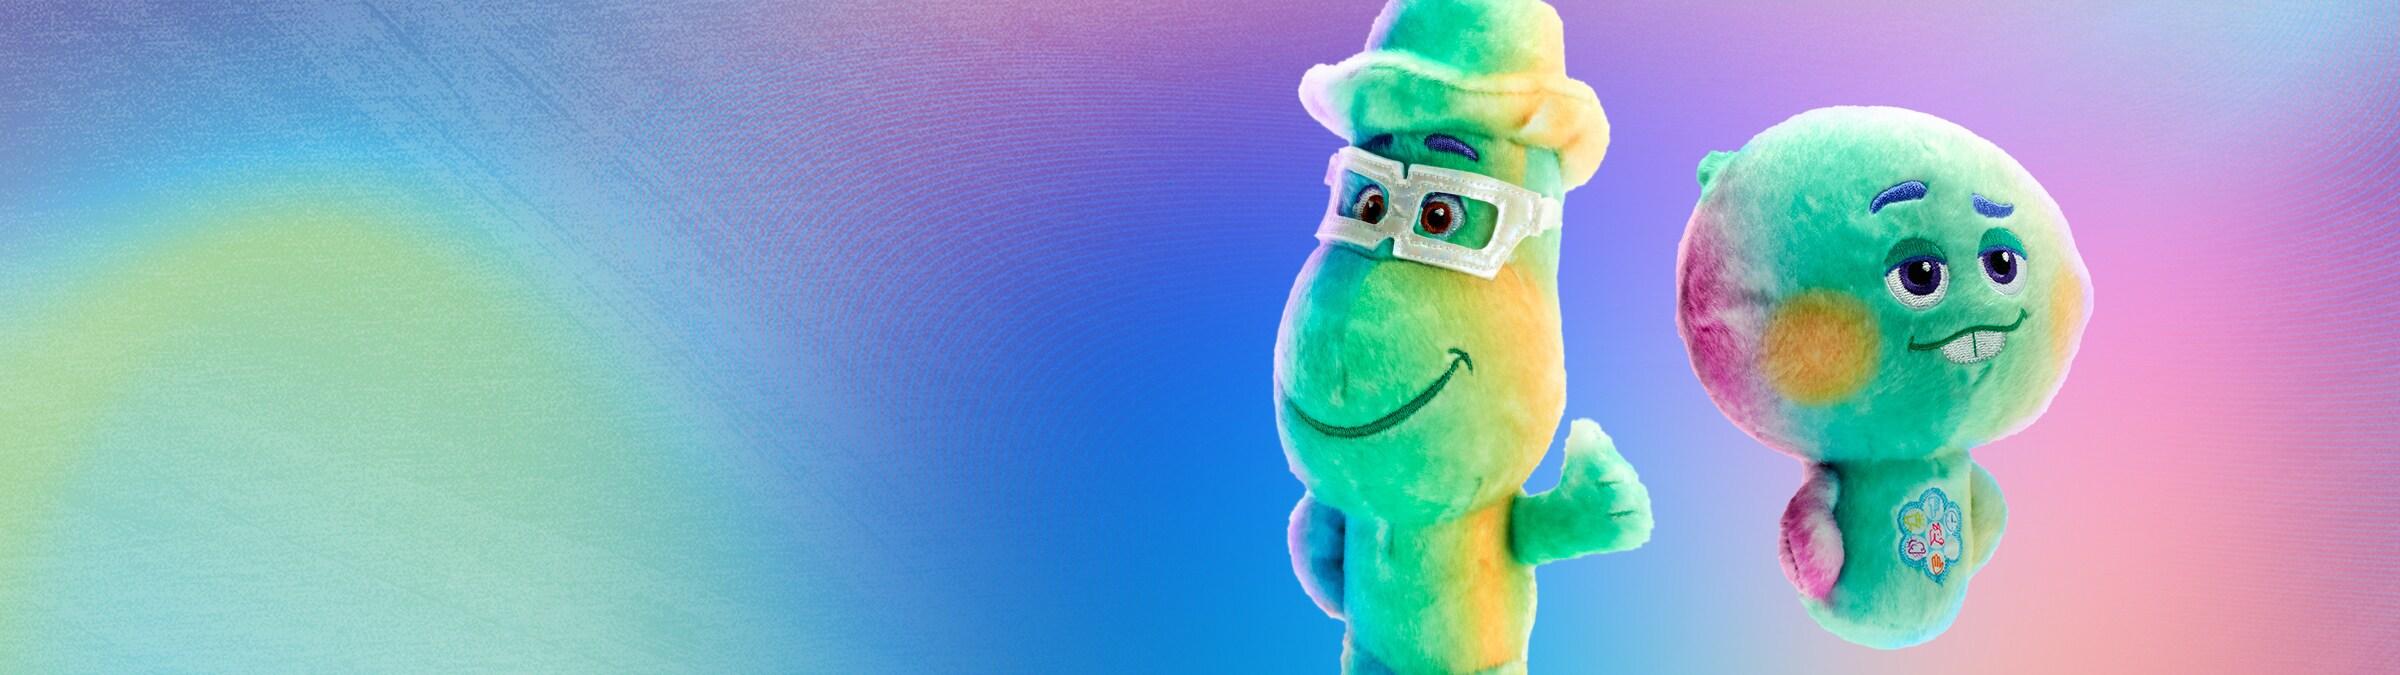 shopDisney Pixar Soul